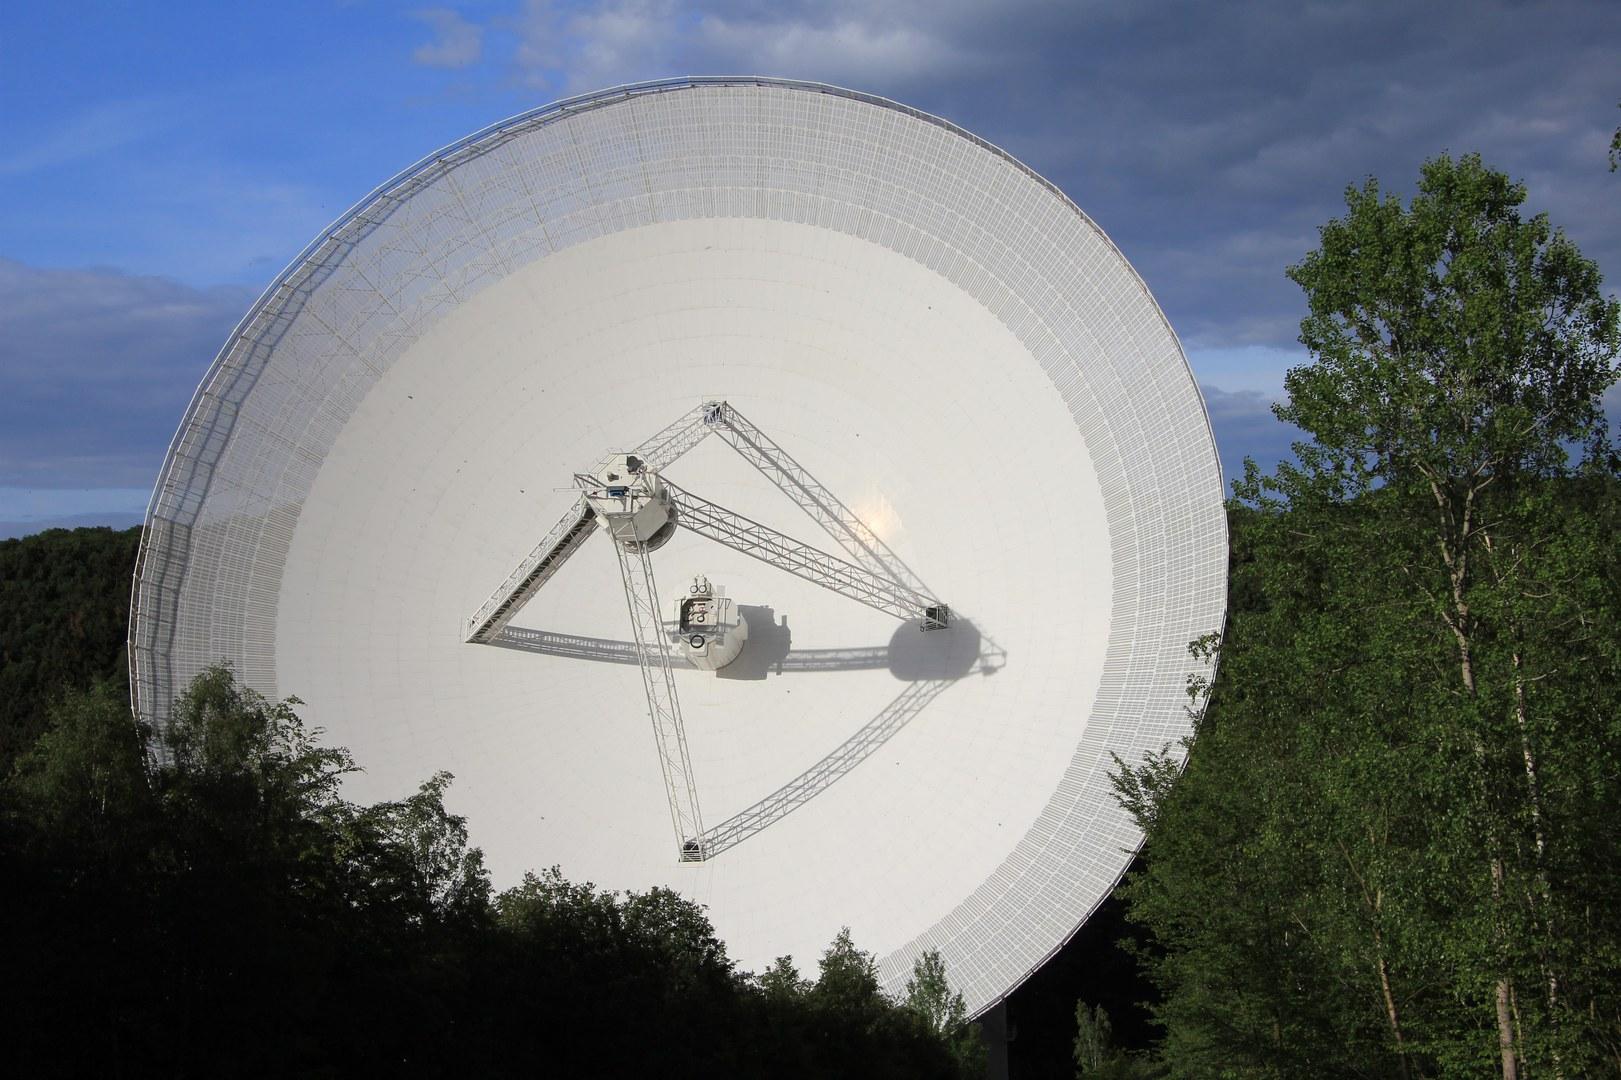 Das 100-Meter-Radioteleskop Effelsberg: